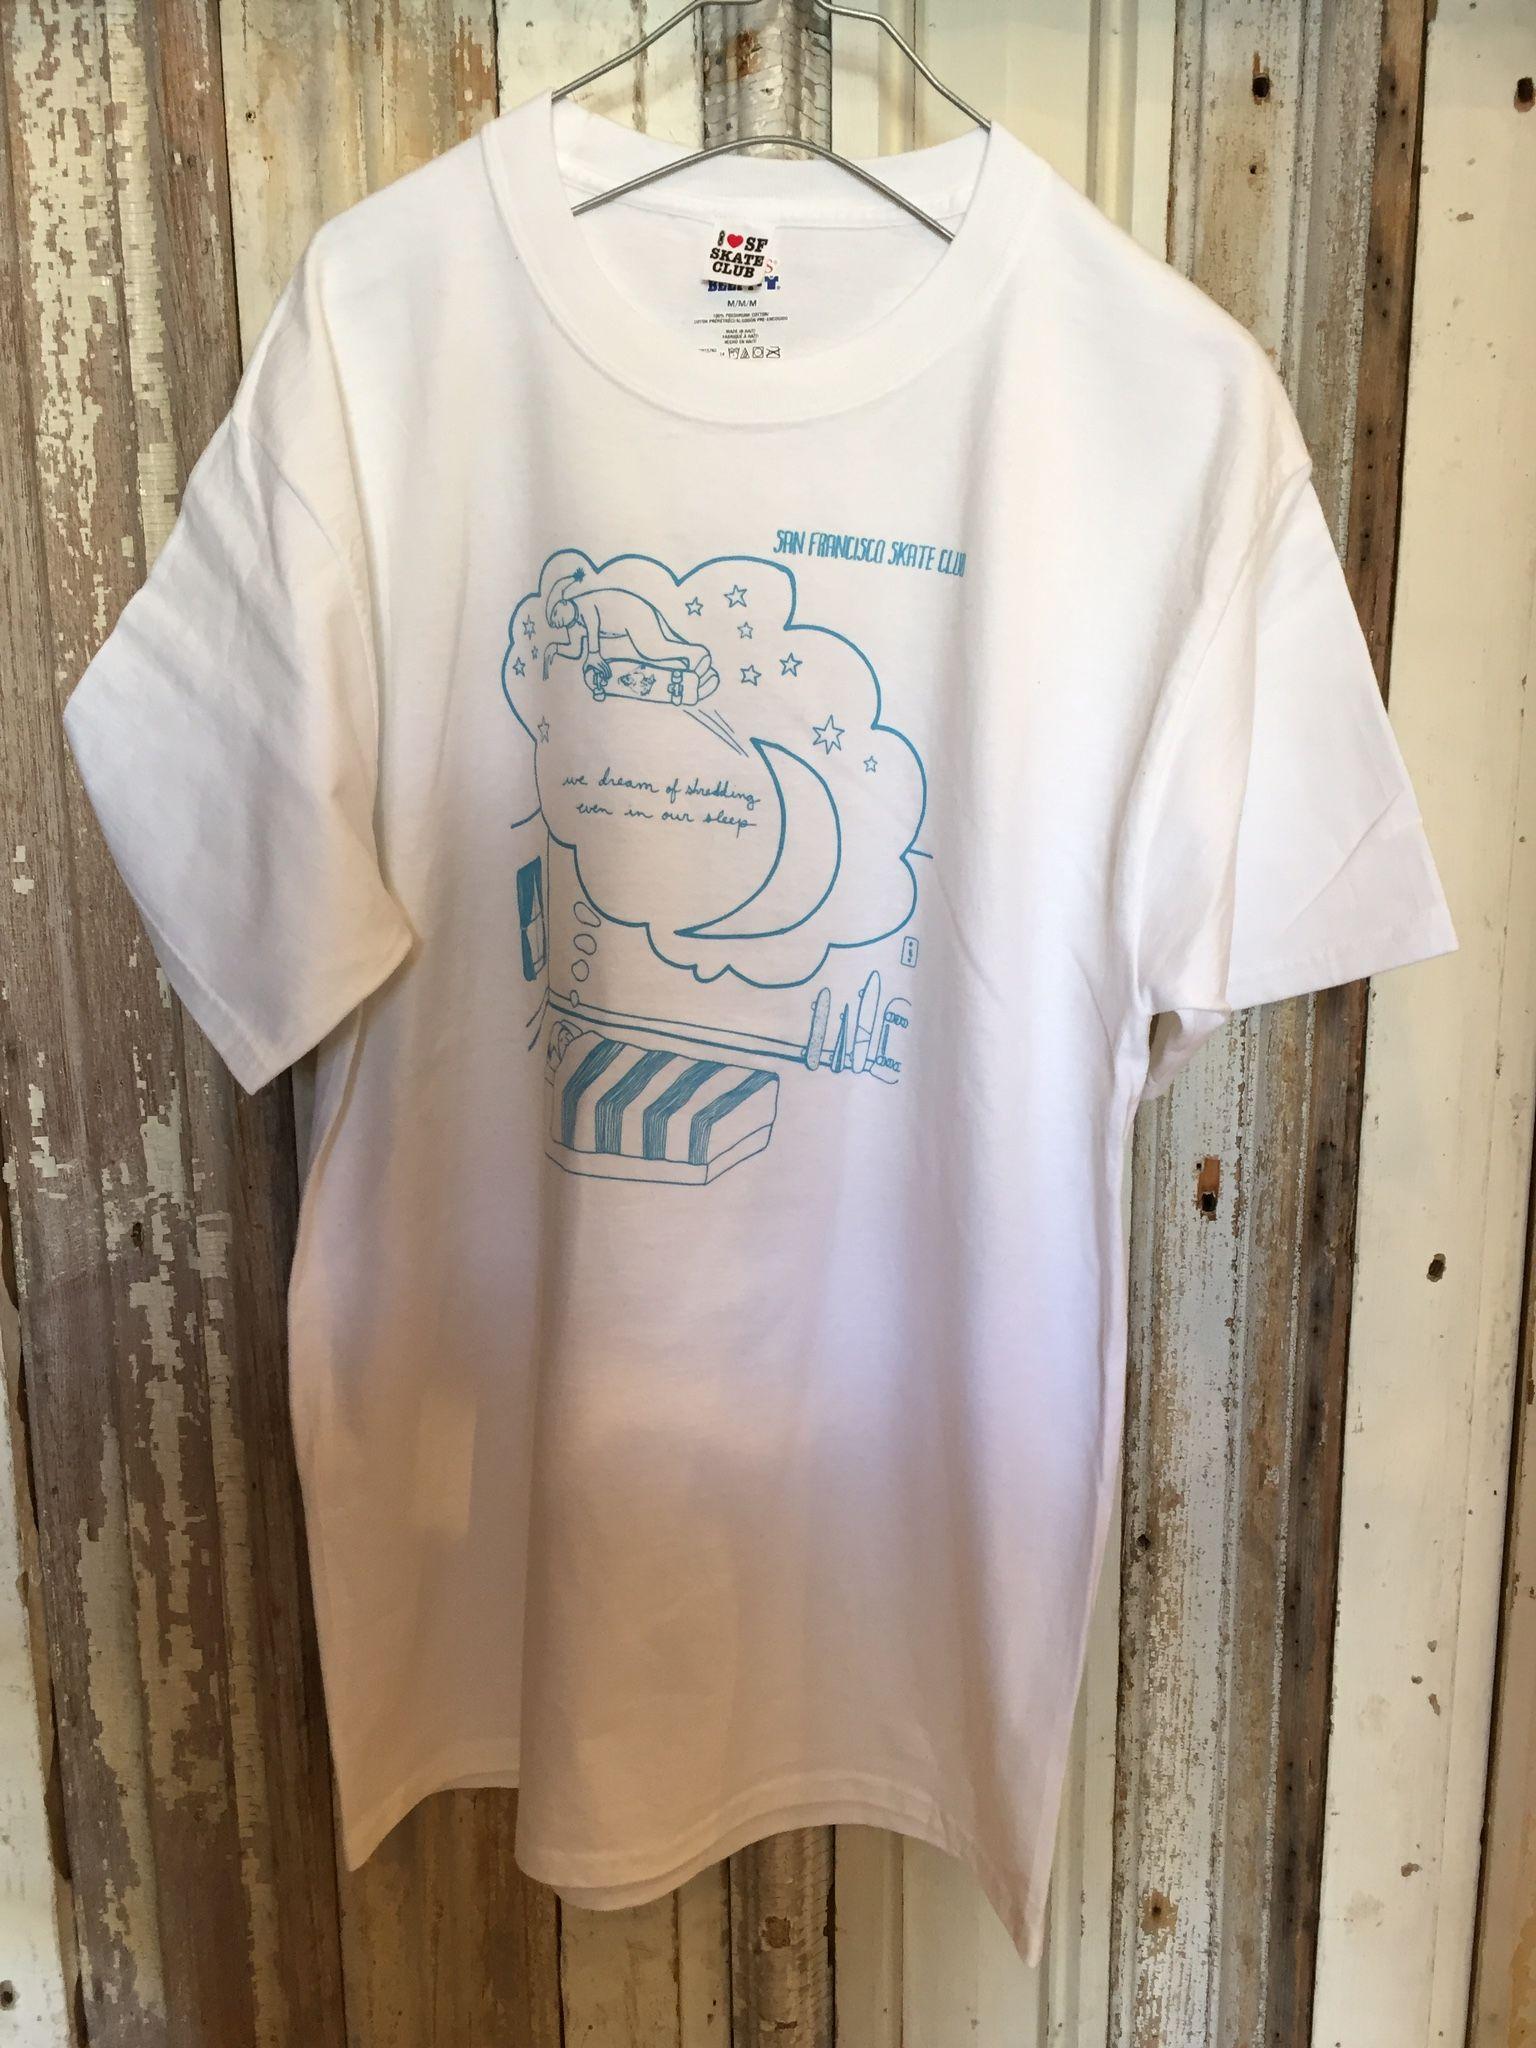 【SANFRANCISCO SKATE CLUB】Tシャツ タイプA